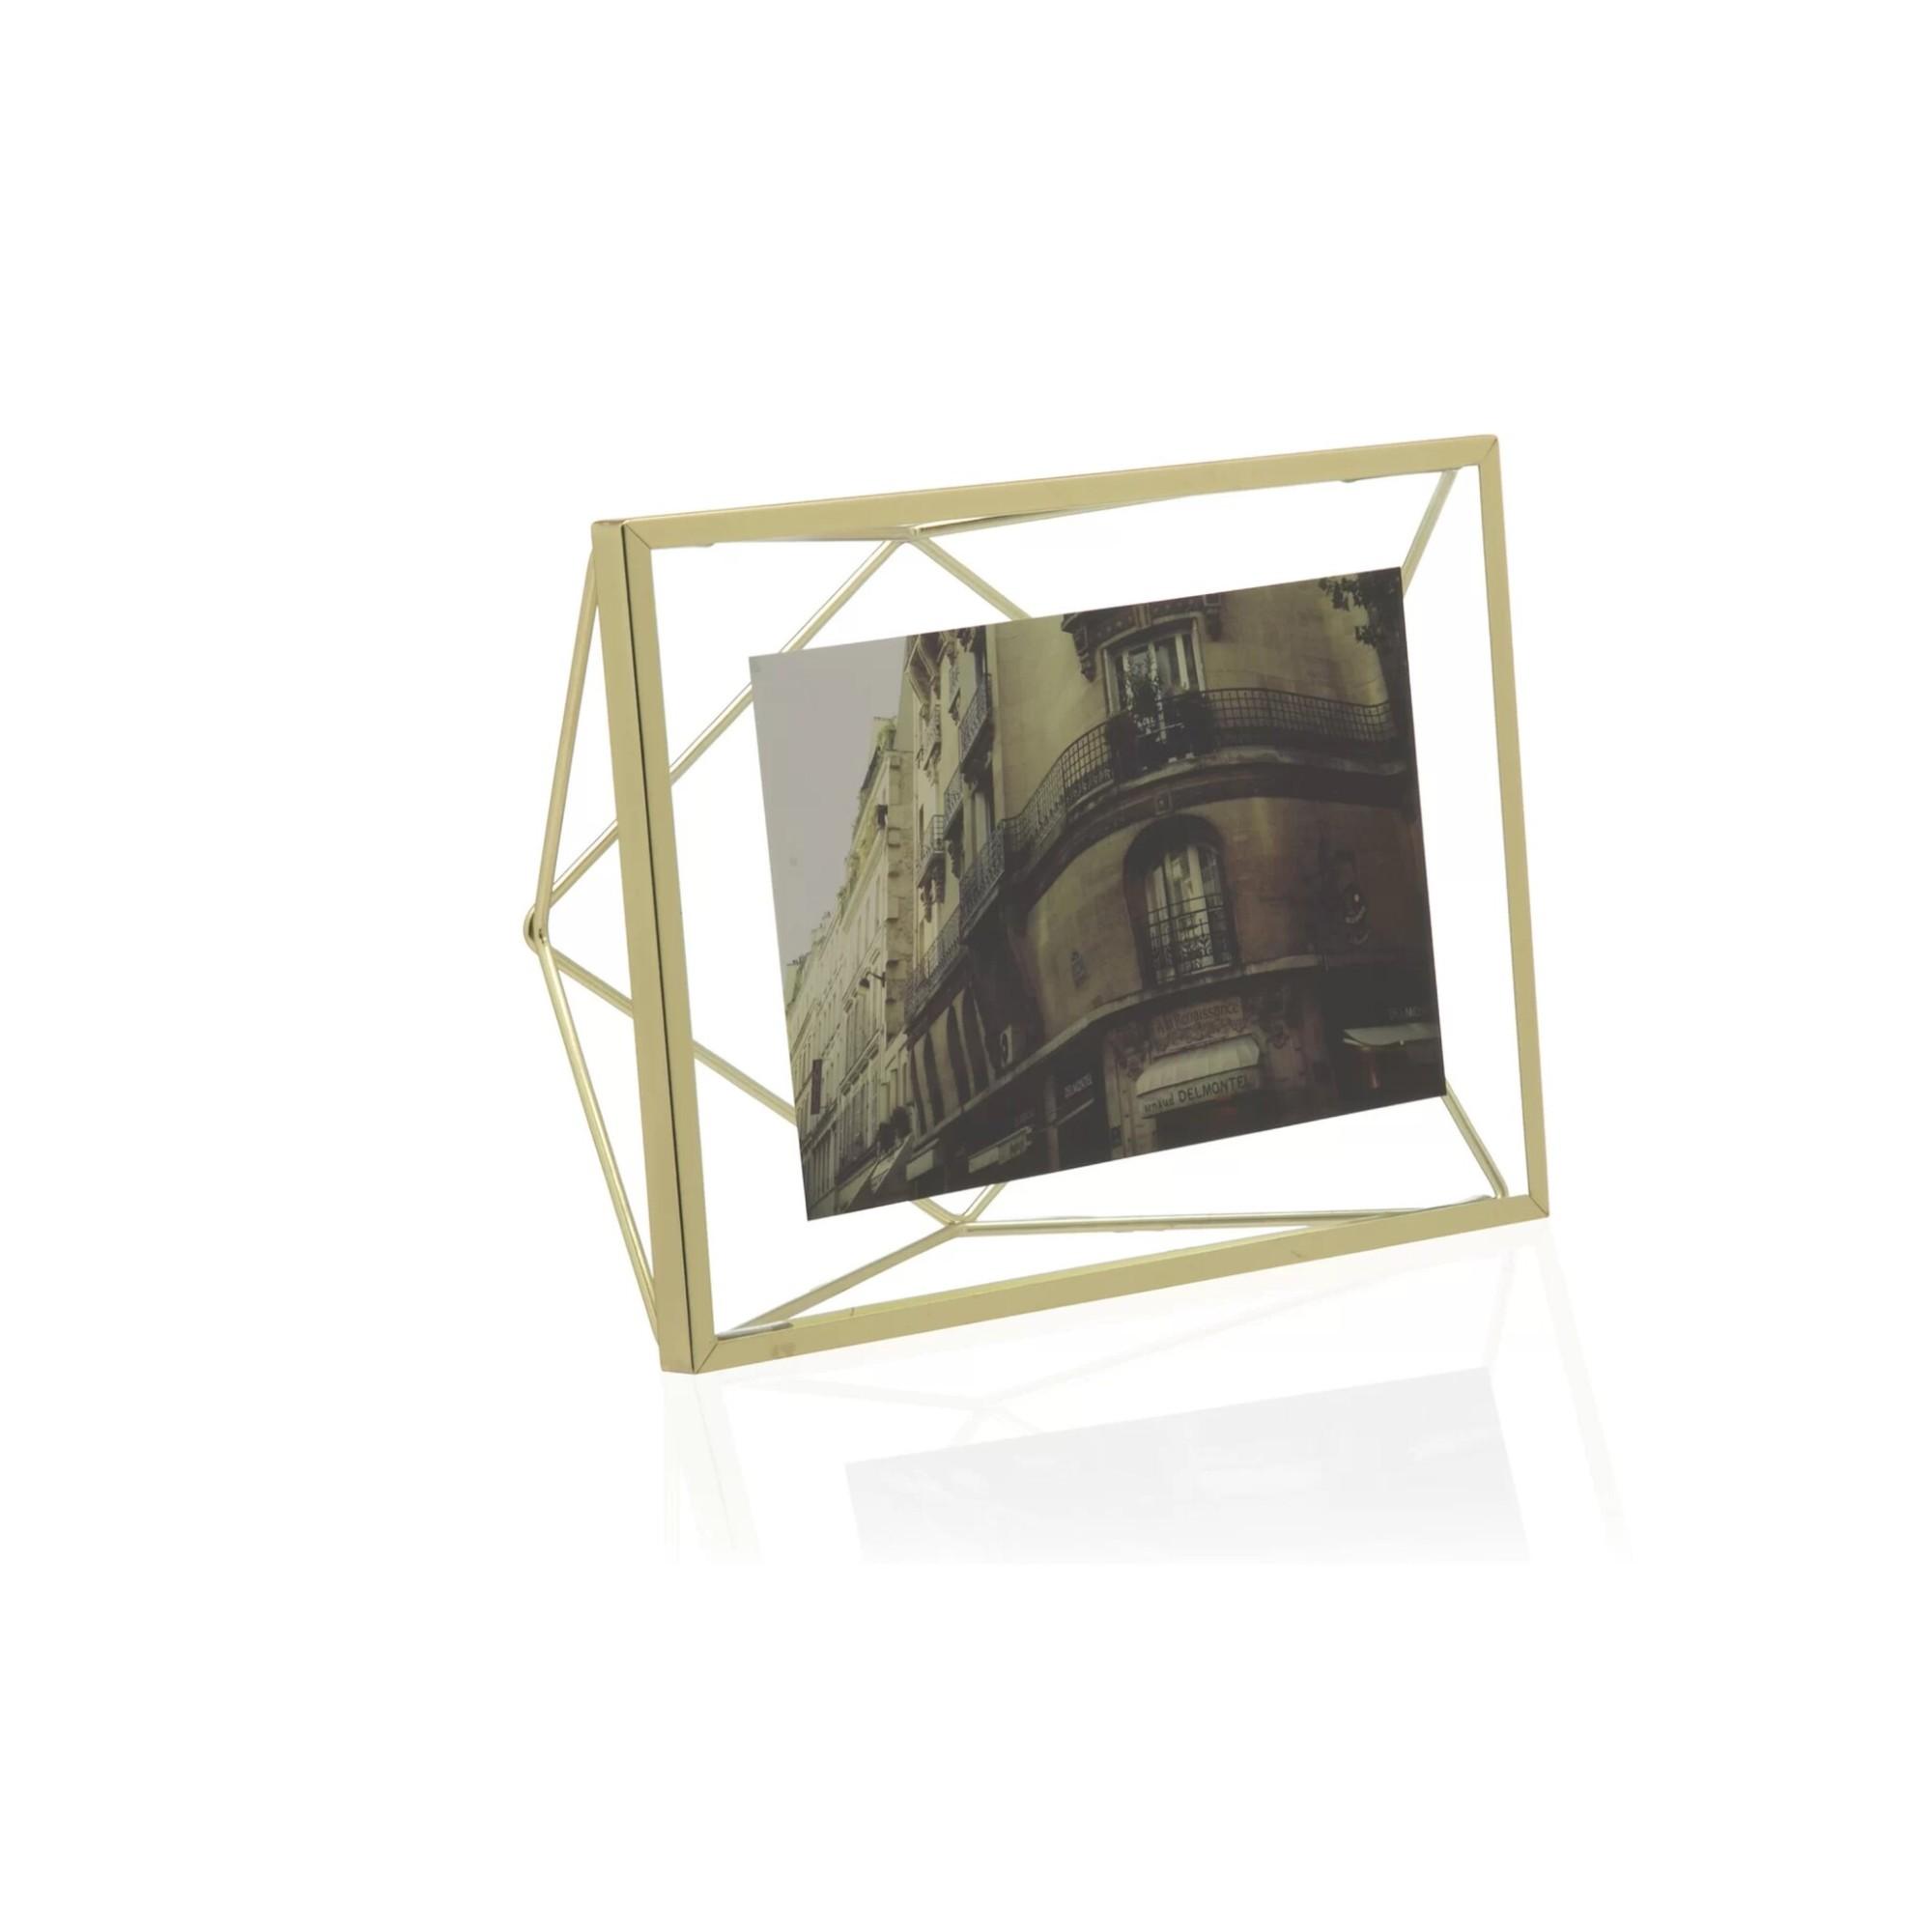 Porta Retrato Unifoto 15x20 cm Gold PR024 - Casambiente